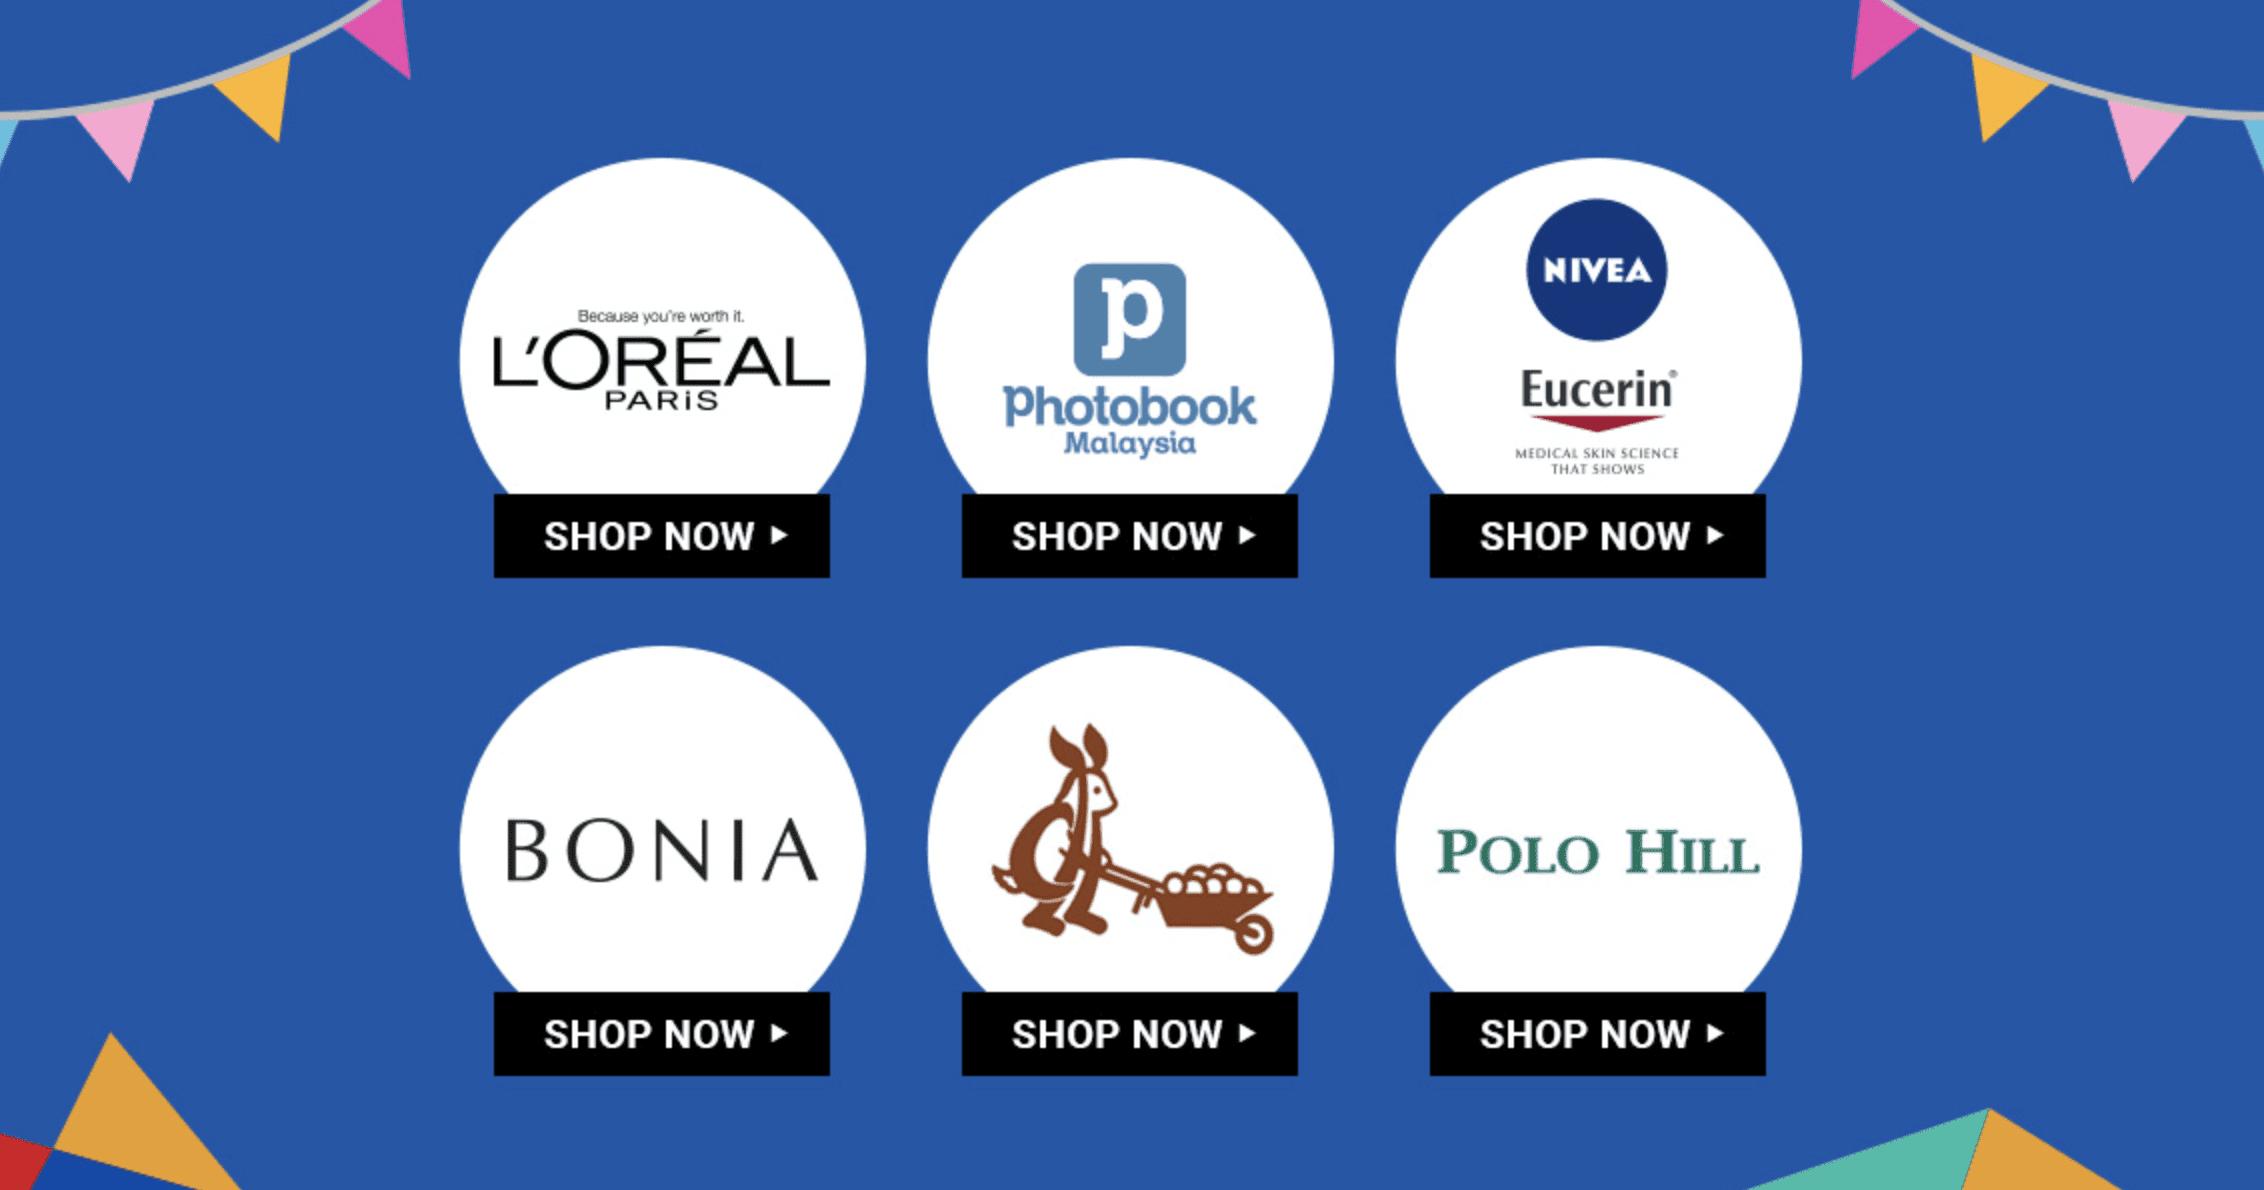 shopee brands sale 1212